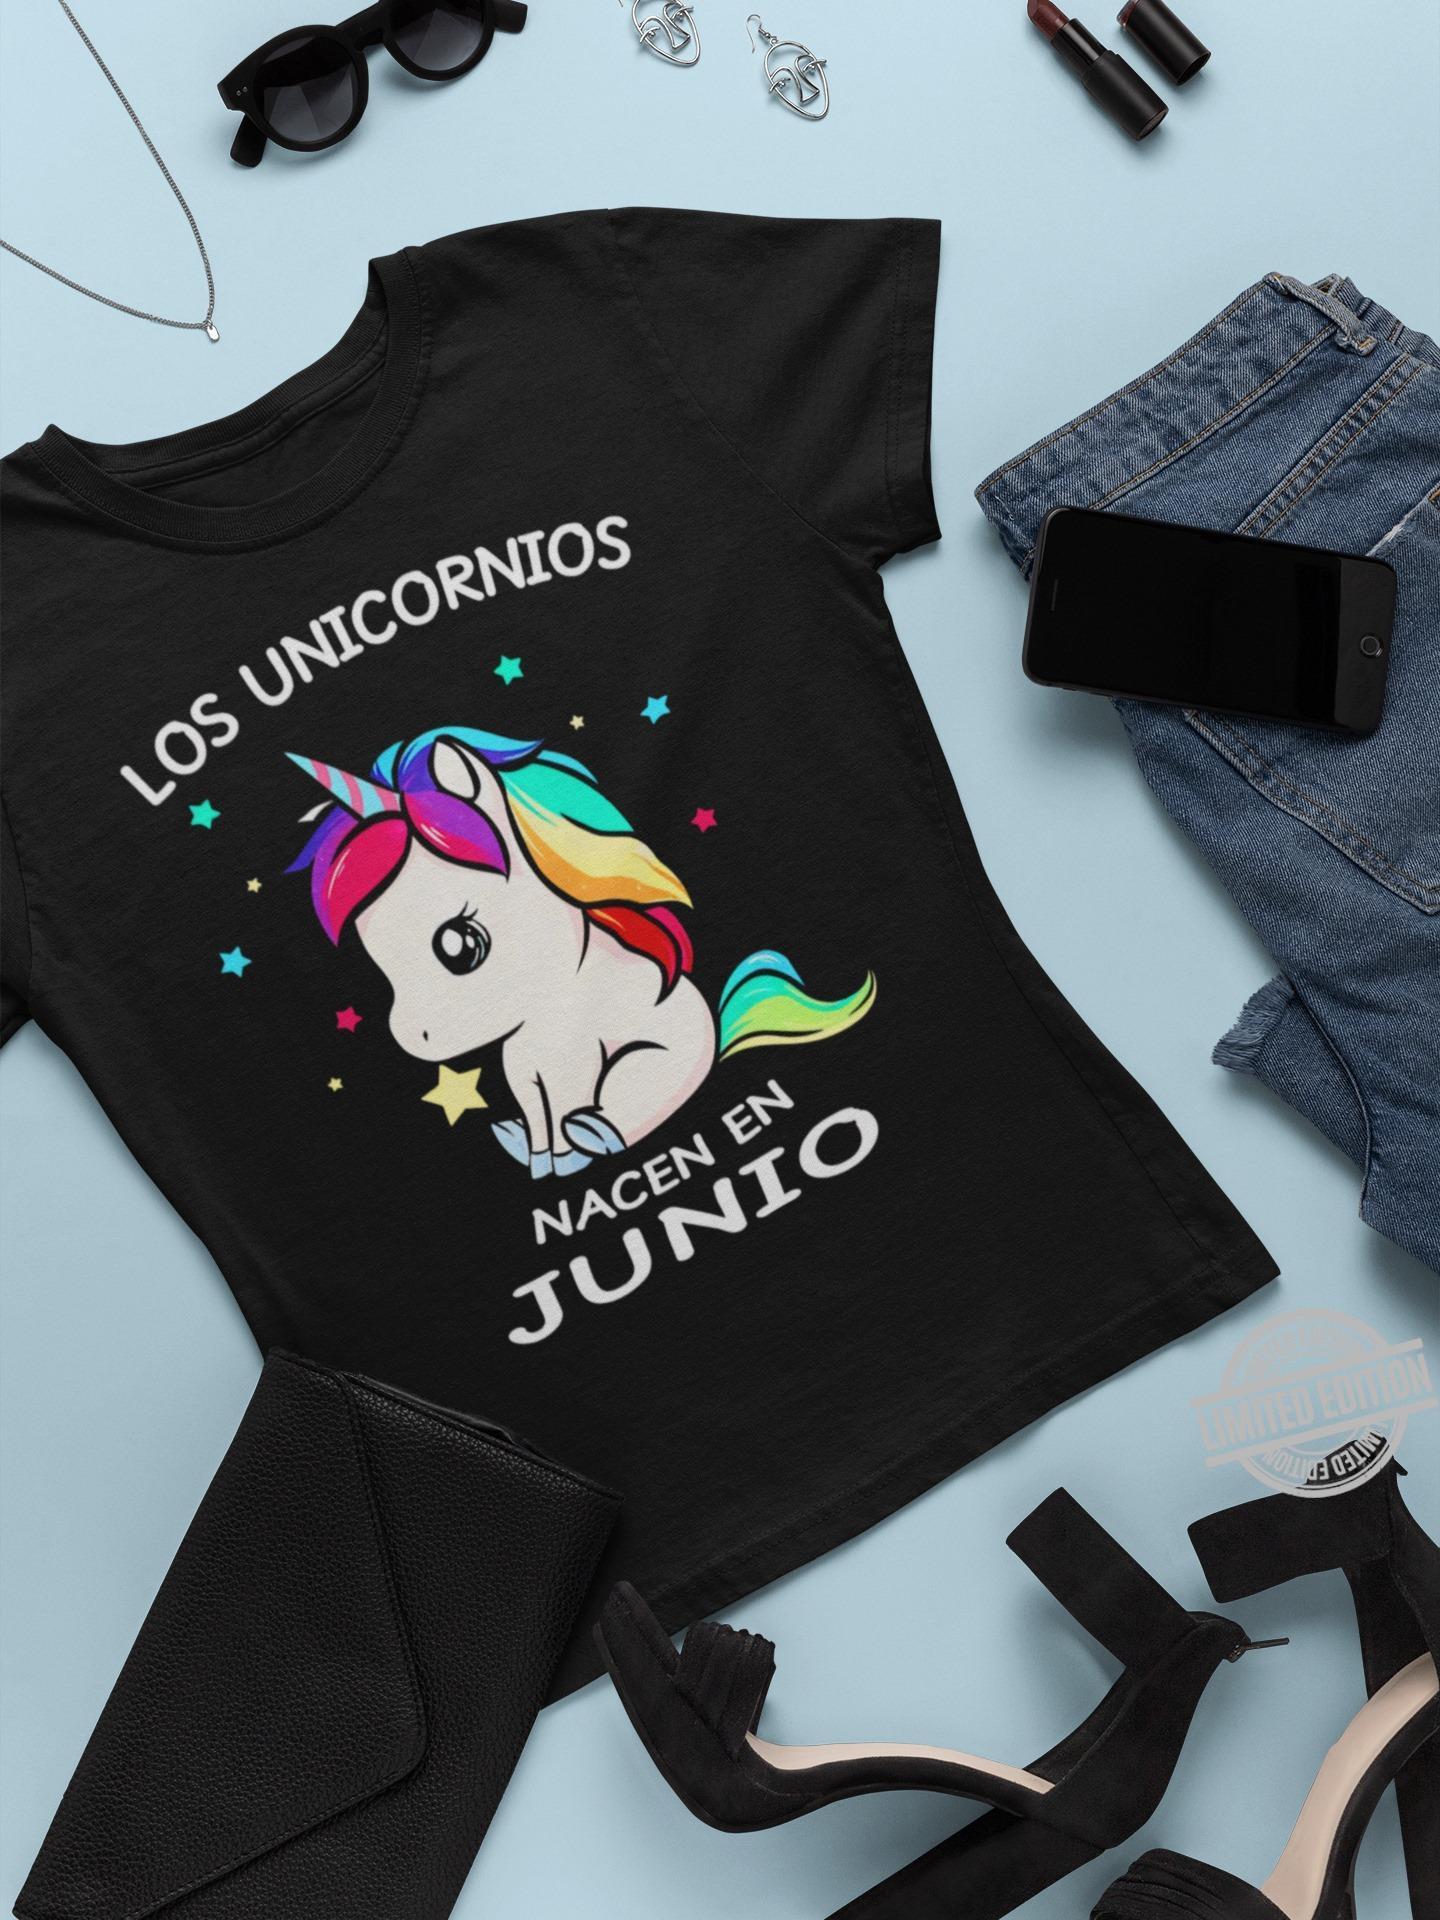 Los Unicornios Nacen En Junio Shirt